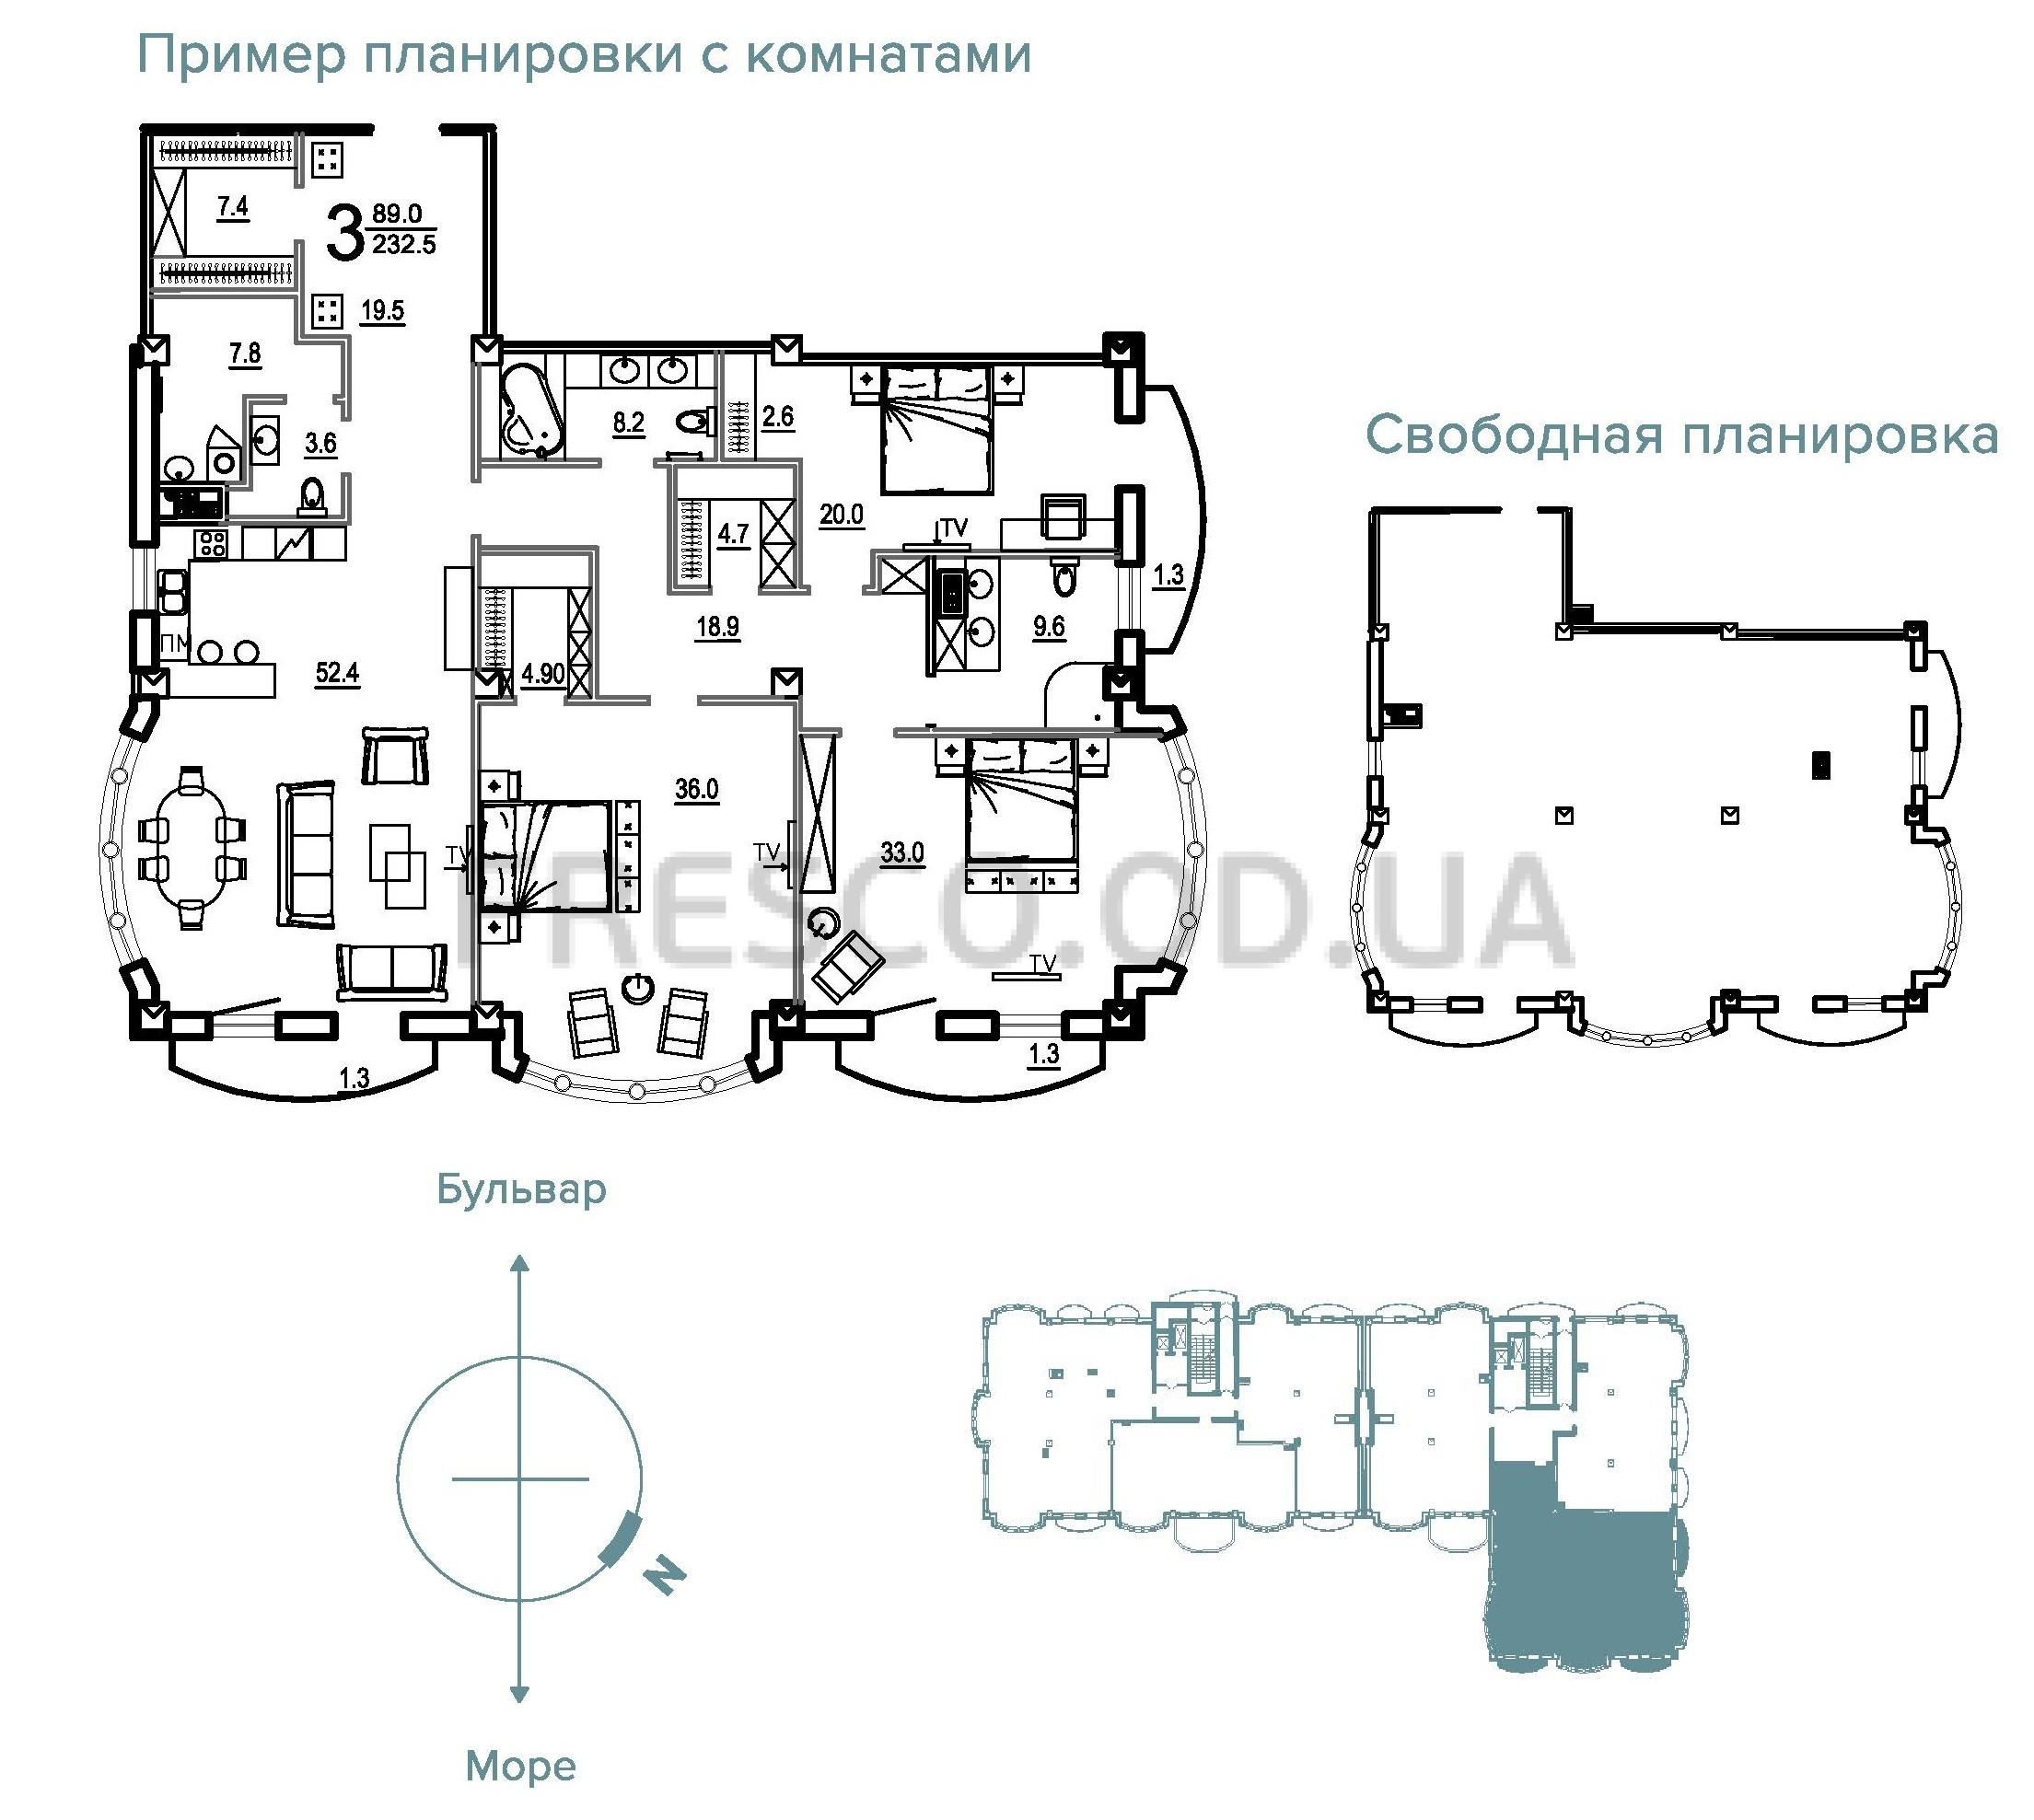 Трехкомнатная - Клубный Дом BIARRITZ (Биарриц)$418500Площадь:232,5m²